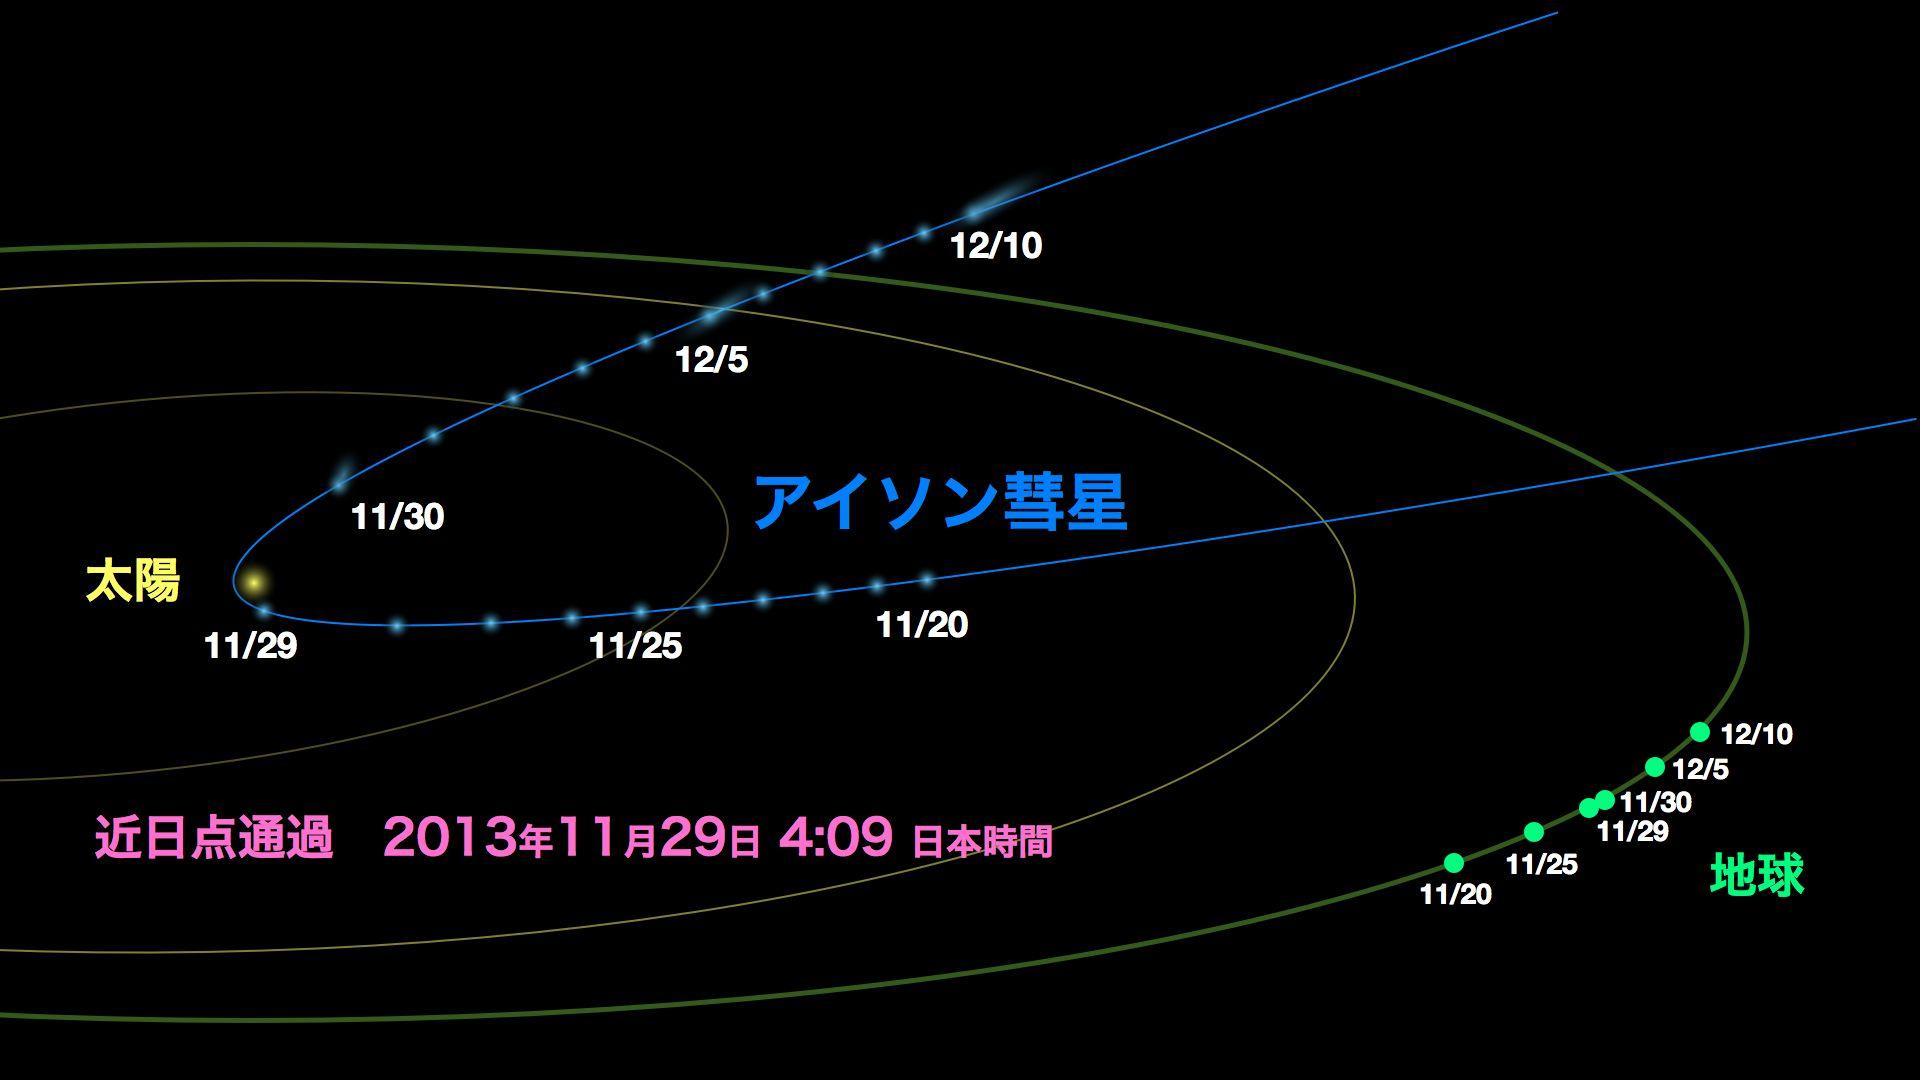 http://www.ncsm.city.nagoya.jp/study/astro/ison.009.jpg